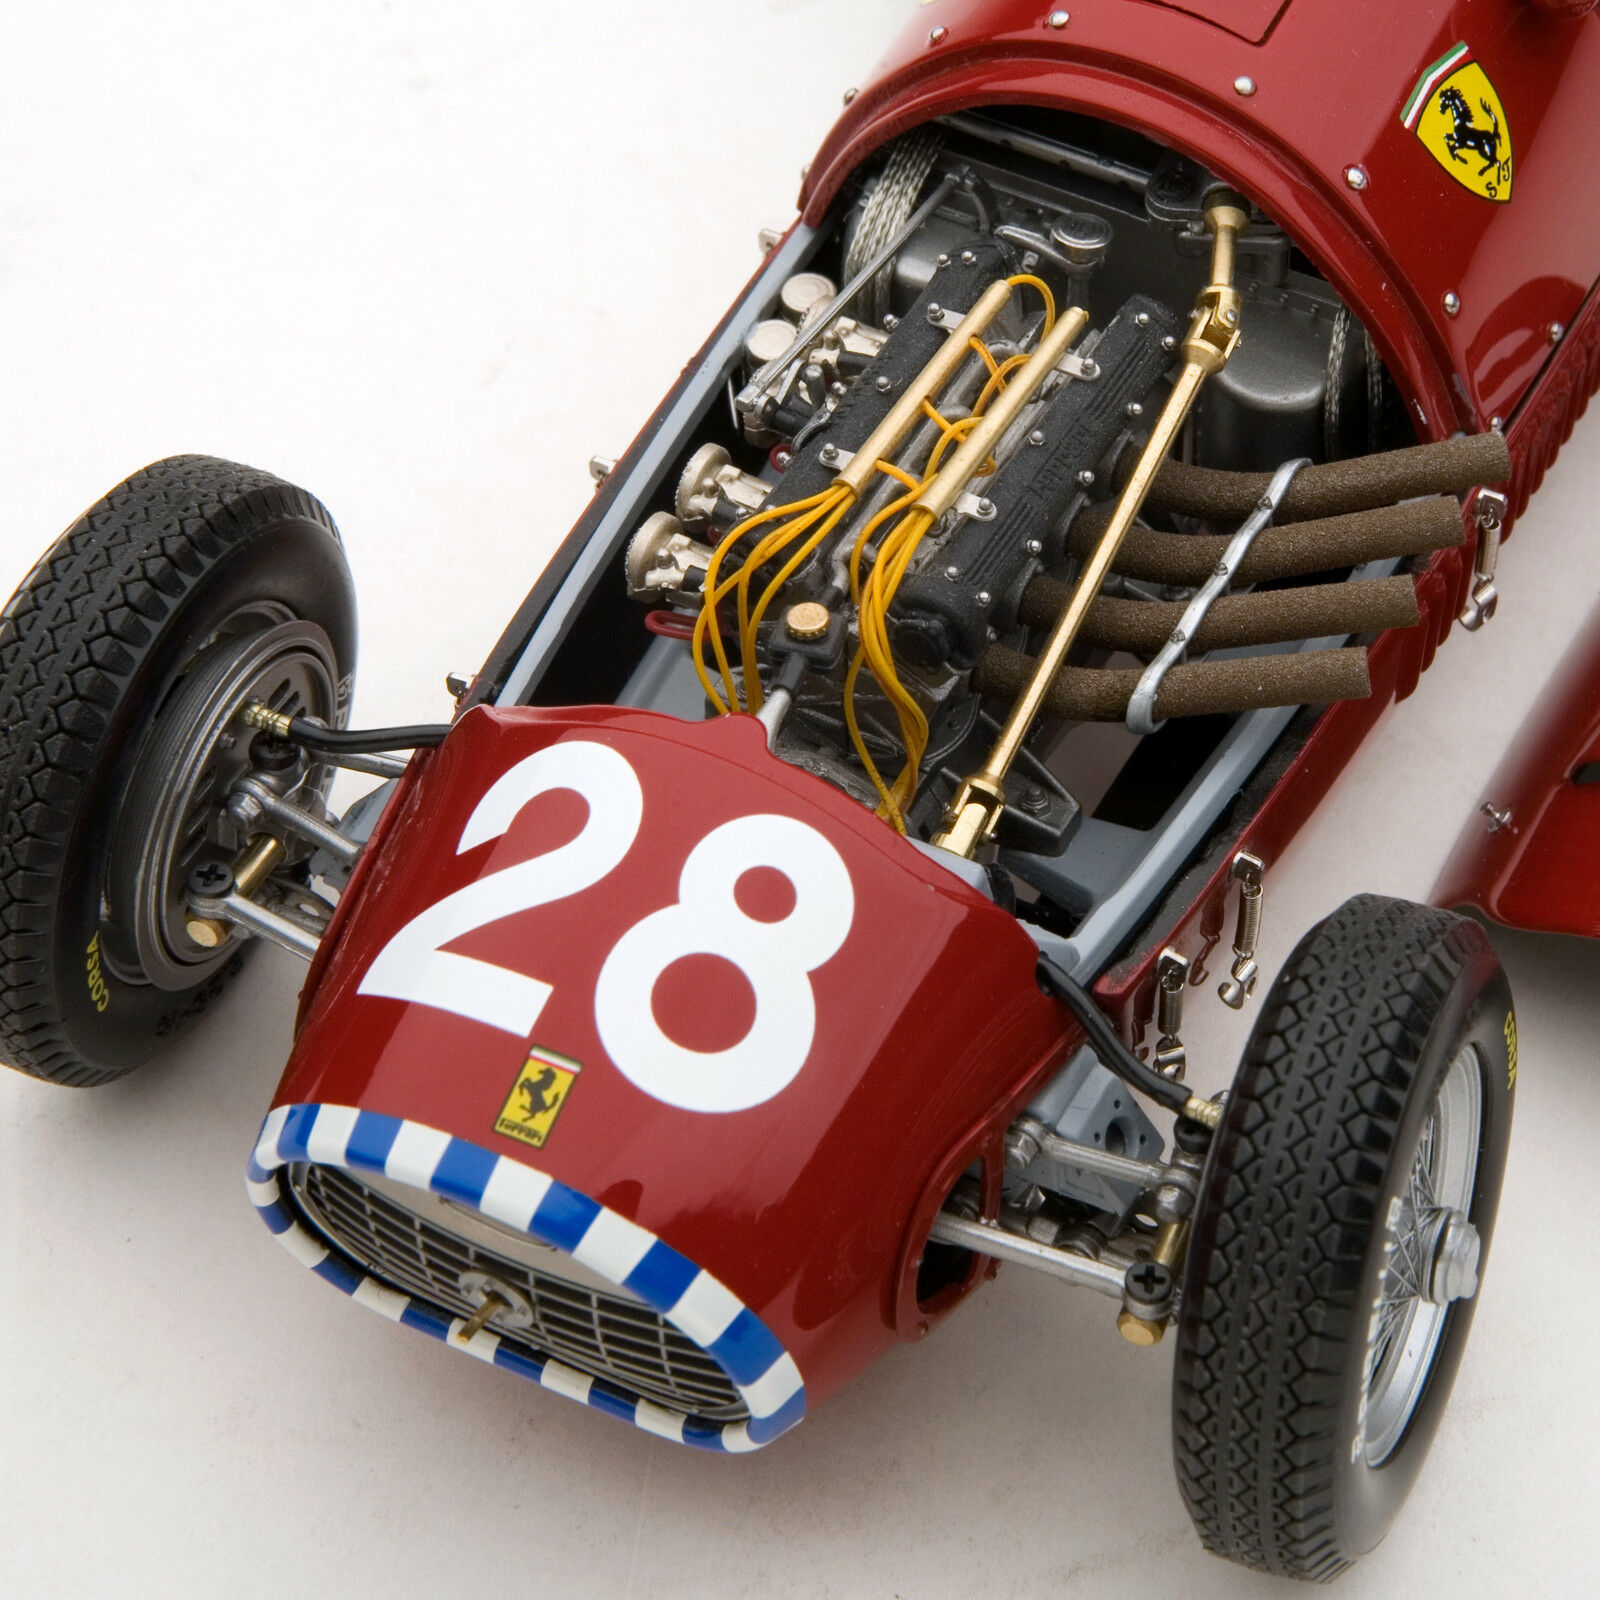 Exoto 1952 Ferrari 500 F2   Gp Gp Gp Of Switzerland   Nino Farina   1 18    GPC97199  | Die Königin Der Qualität  b91676